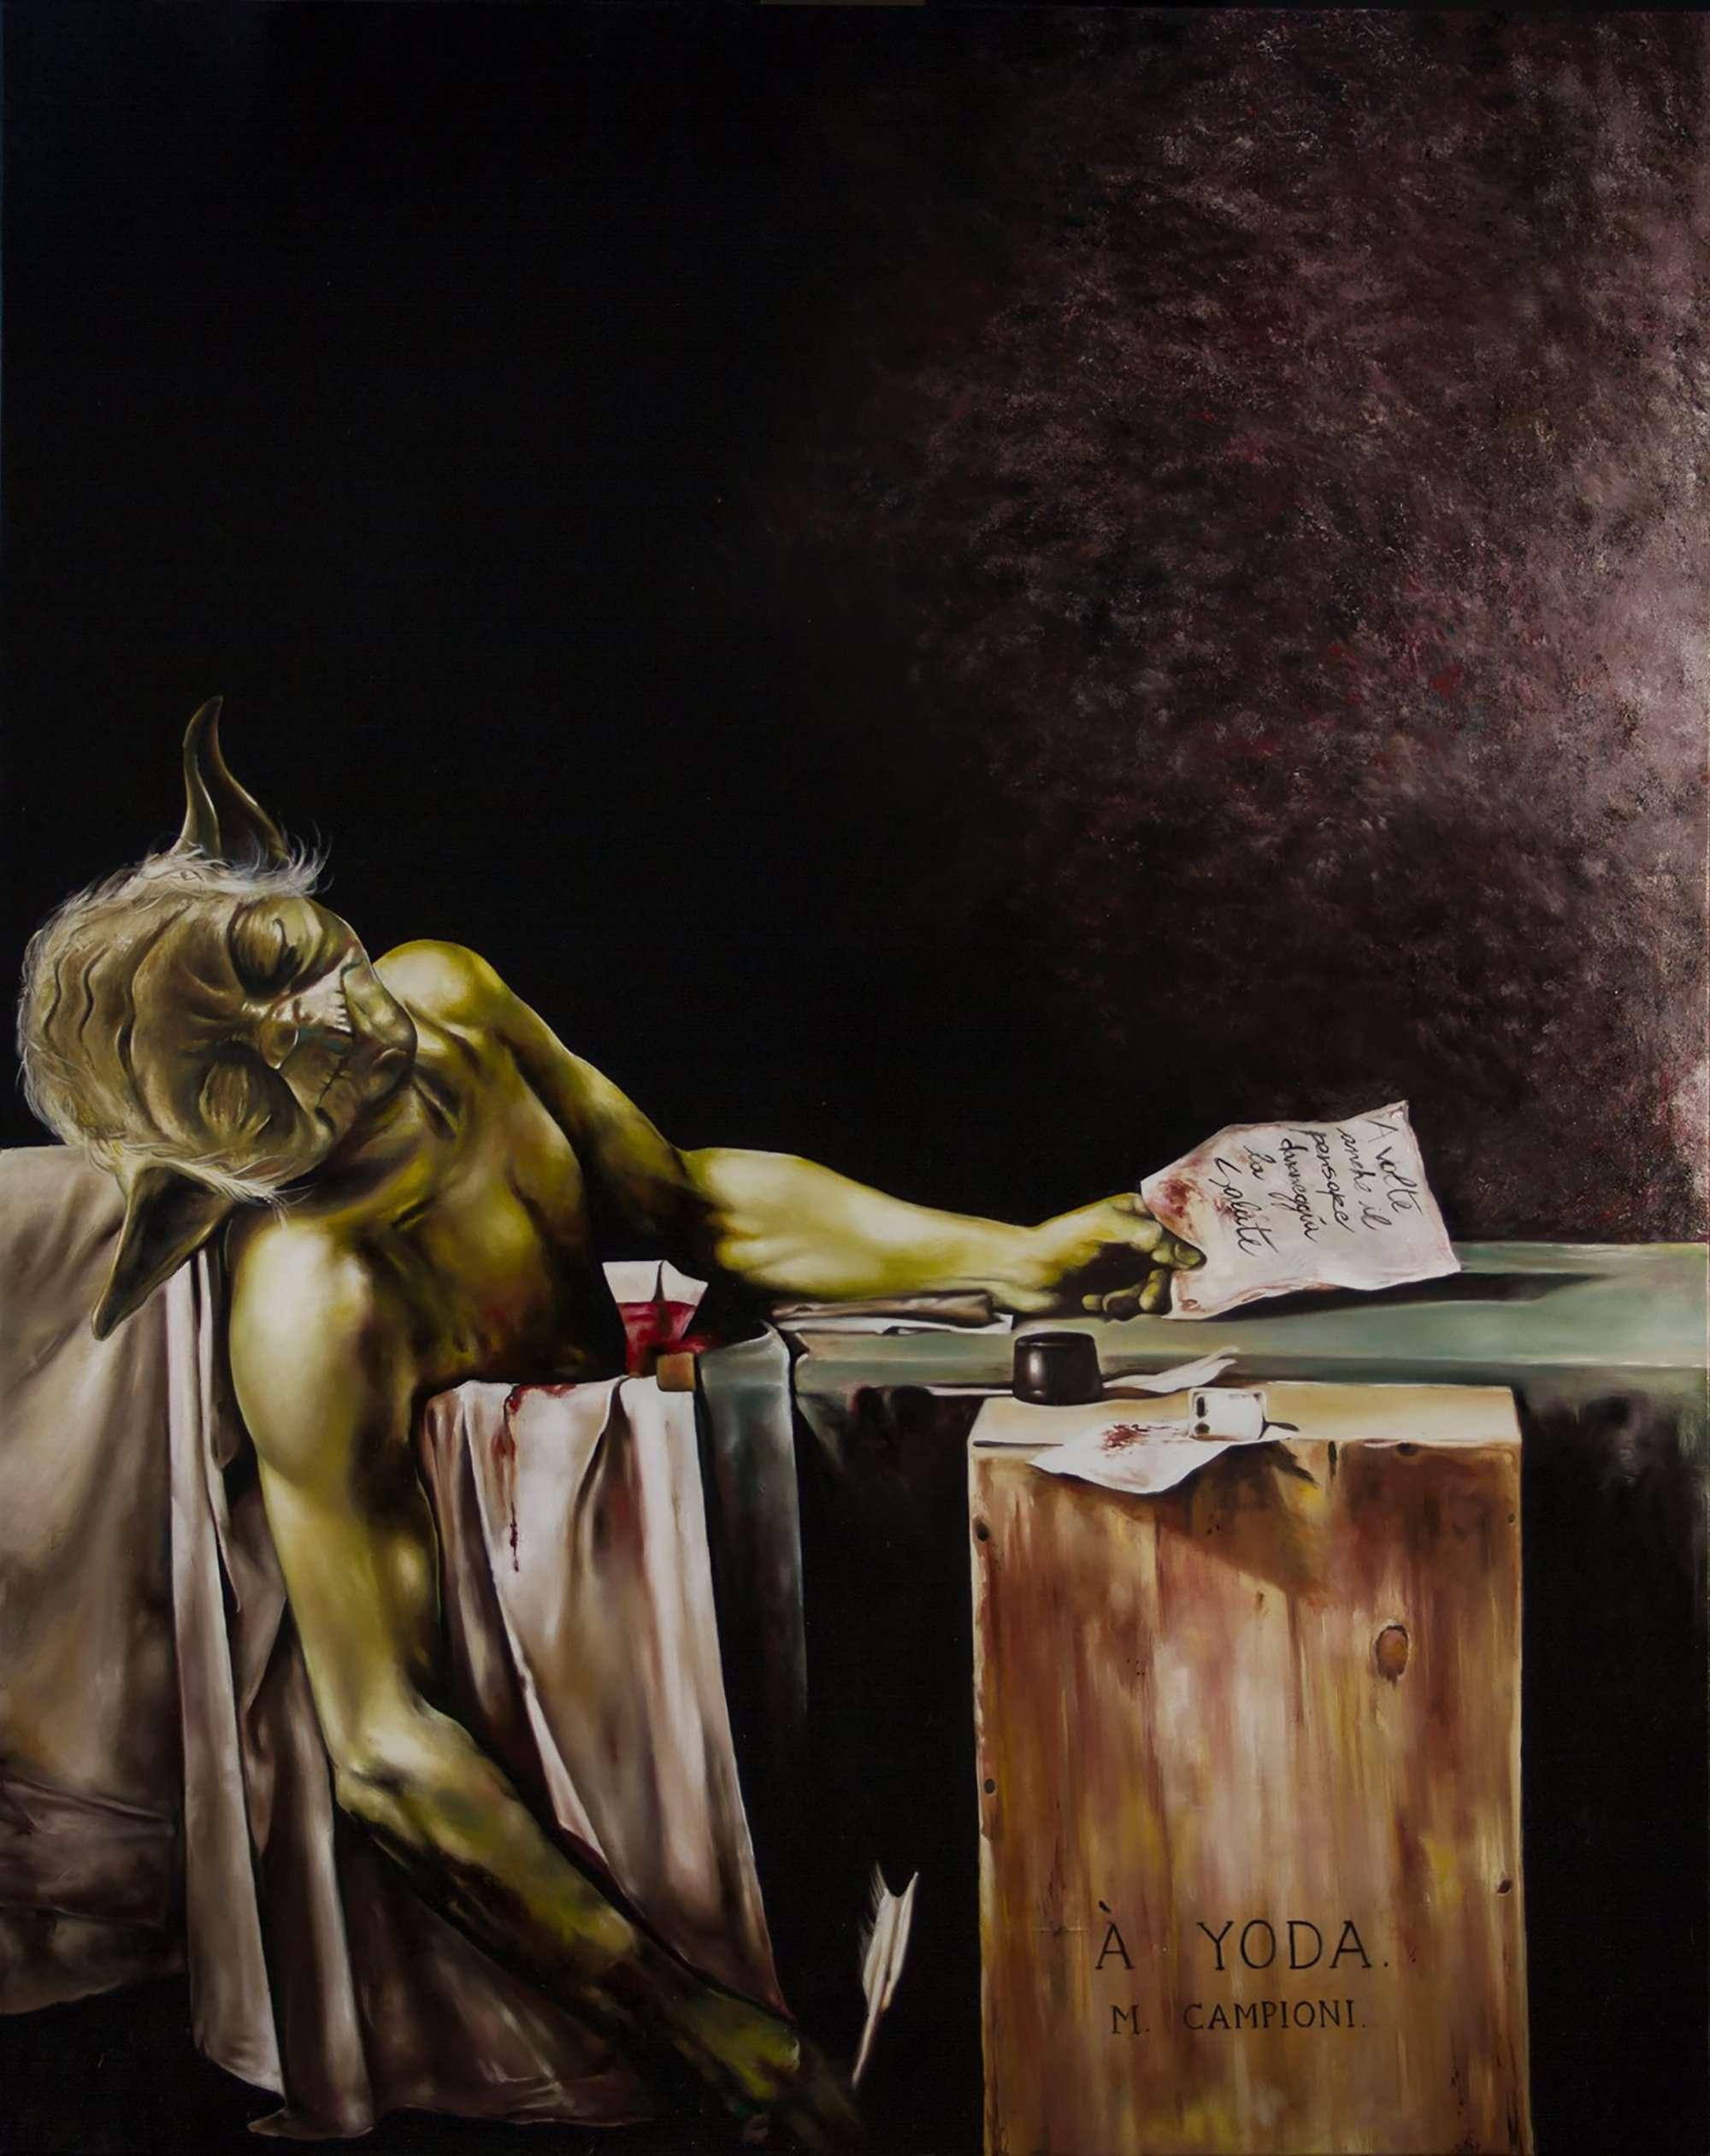 Mirco-Campioni-olio-su-tela-2014-100×80-LA-MORTE-DEL-SAGGIO-Prezzo-3180.jpg